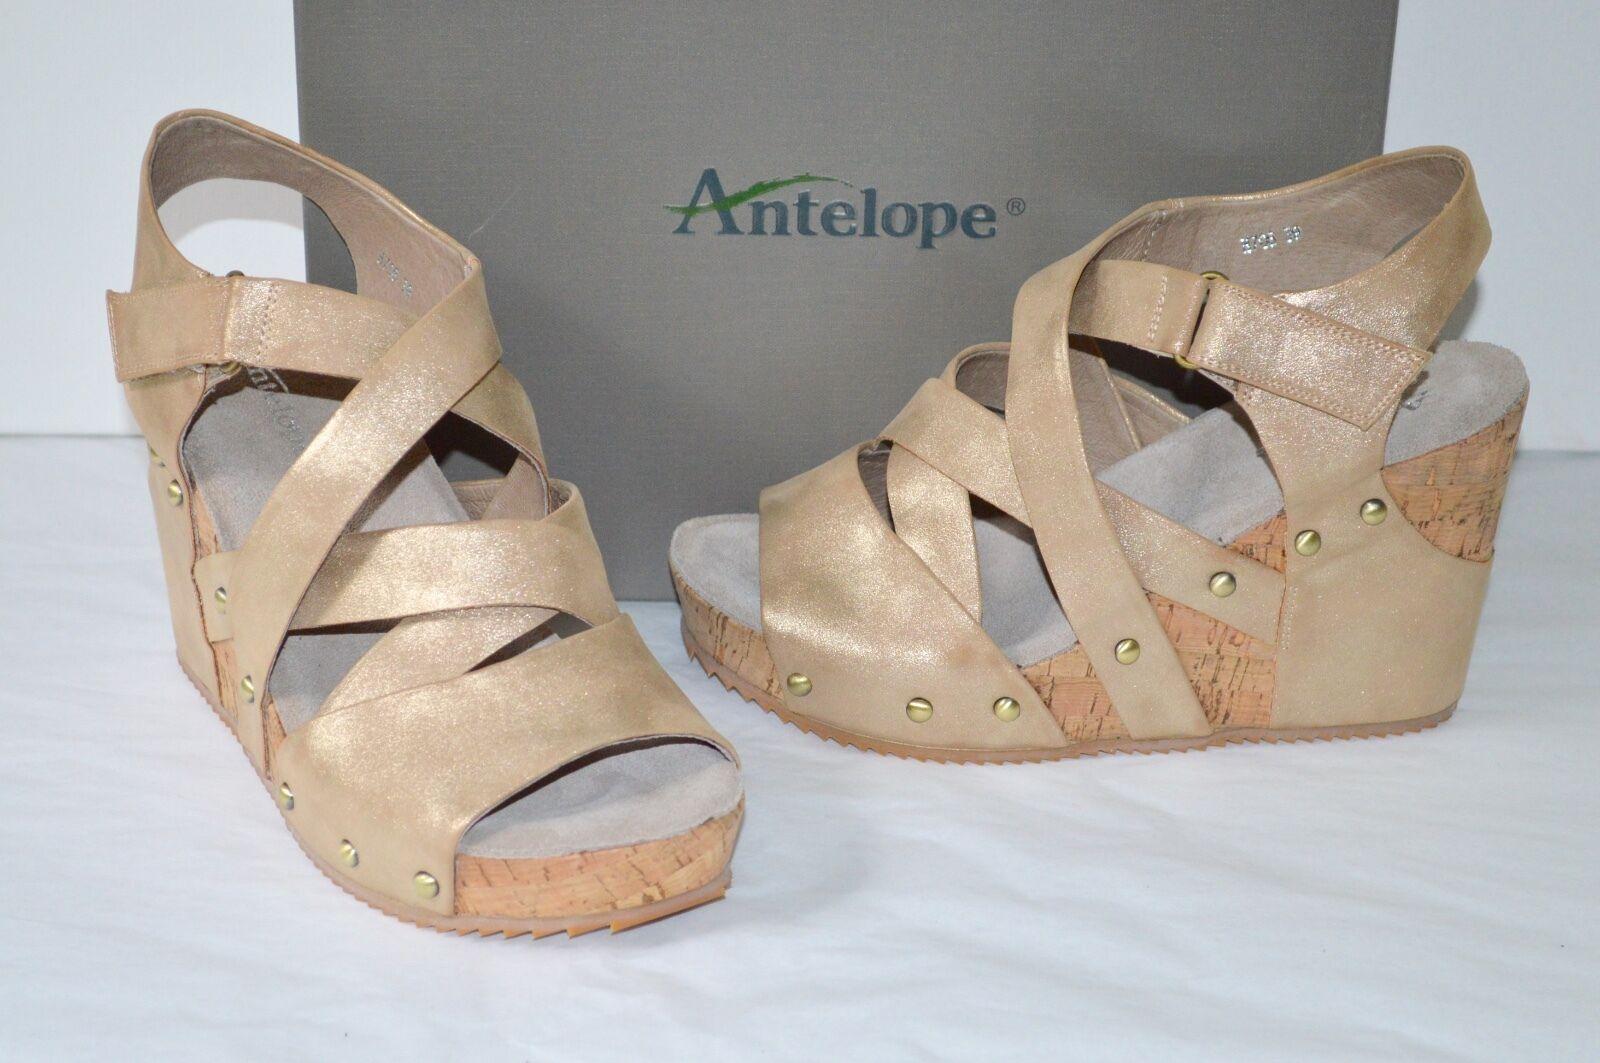 be58a938f1 Buy Womens Antelope 706 Criss Cross Wedge Sandal Metallic Leather ...